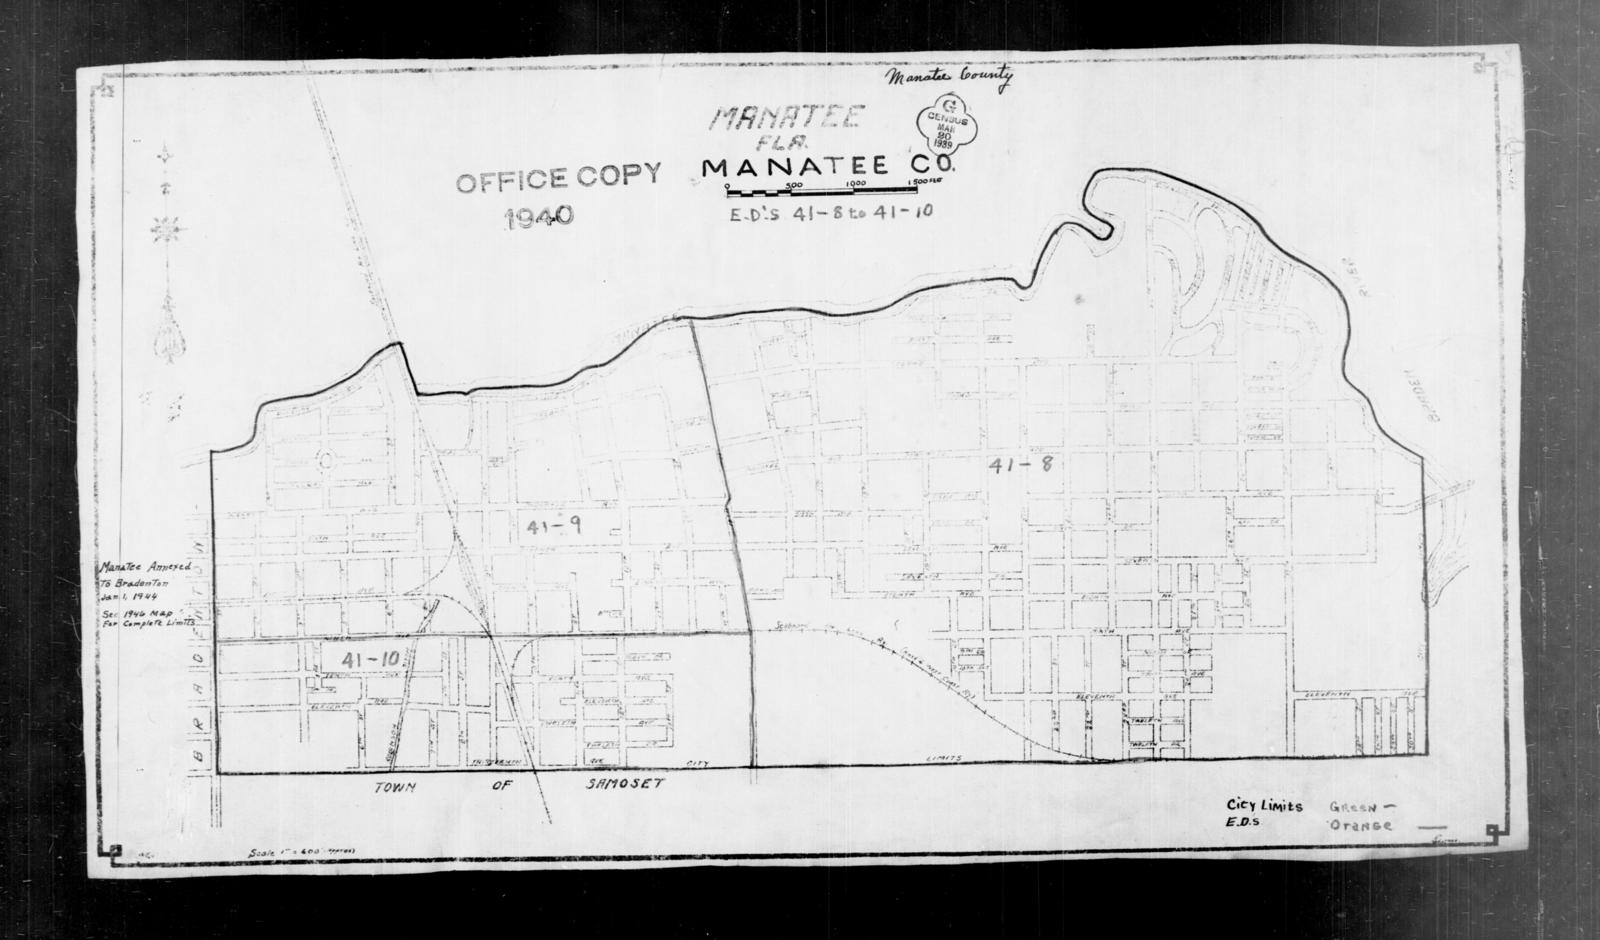 1940 Census Enumeration District Maps Florida Manatee County